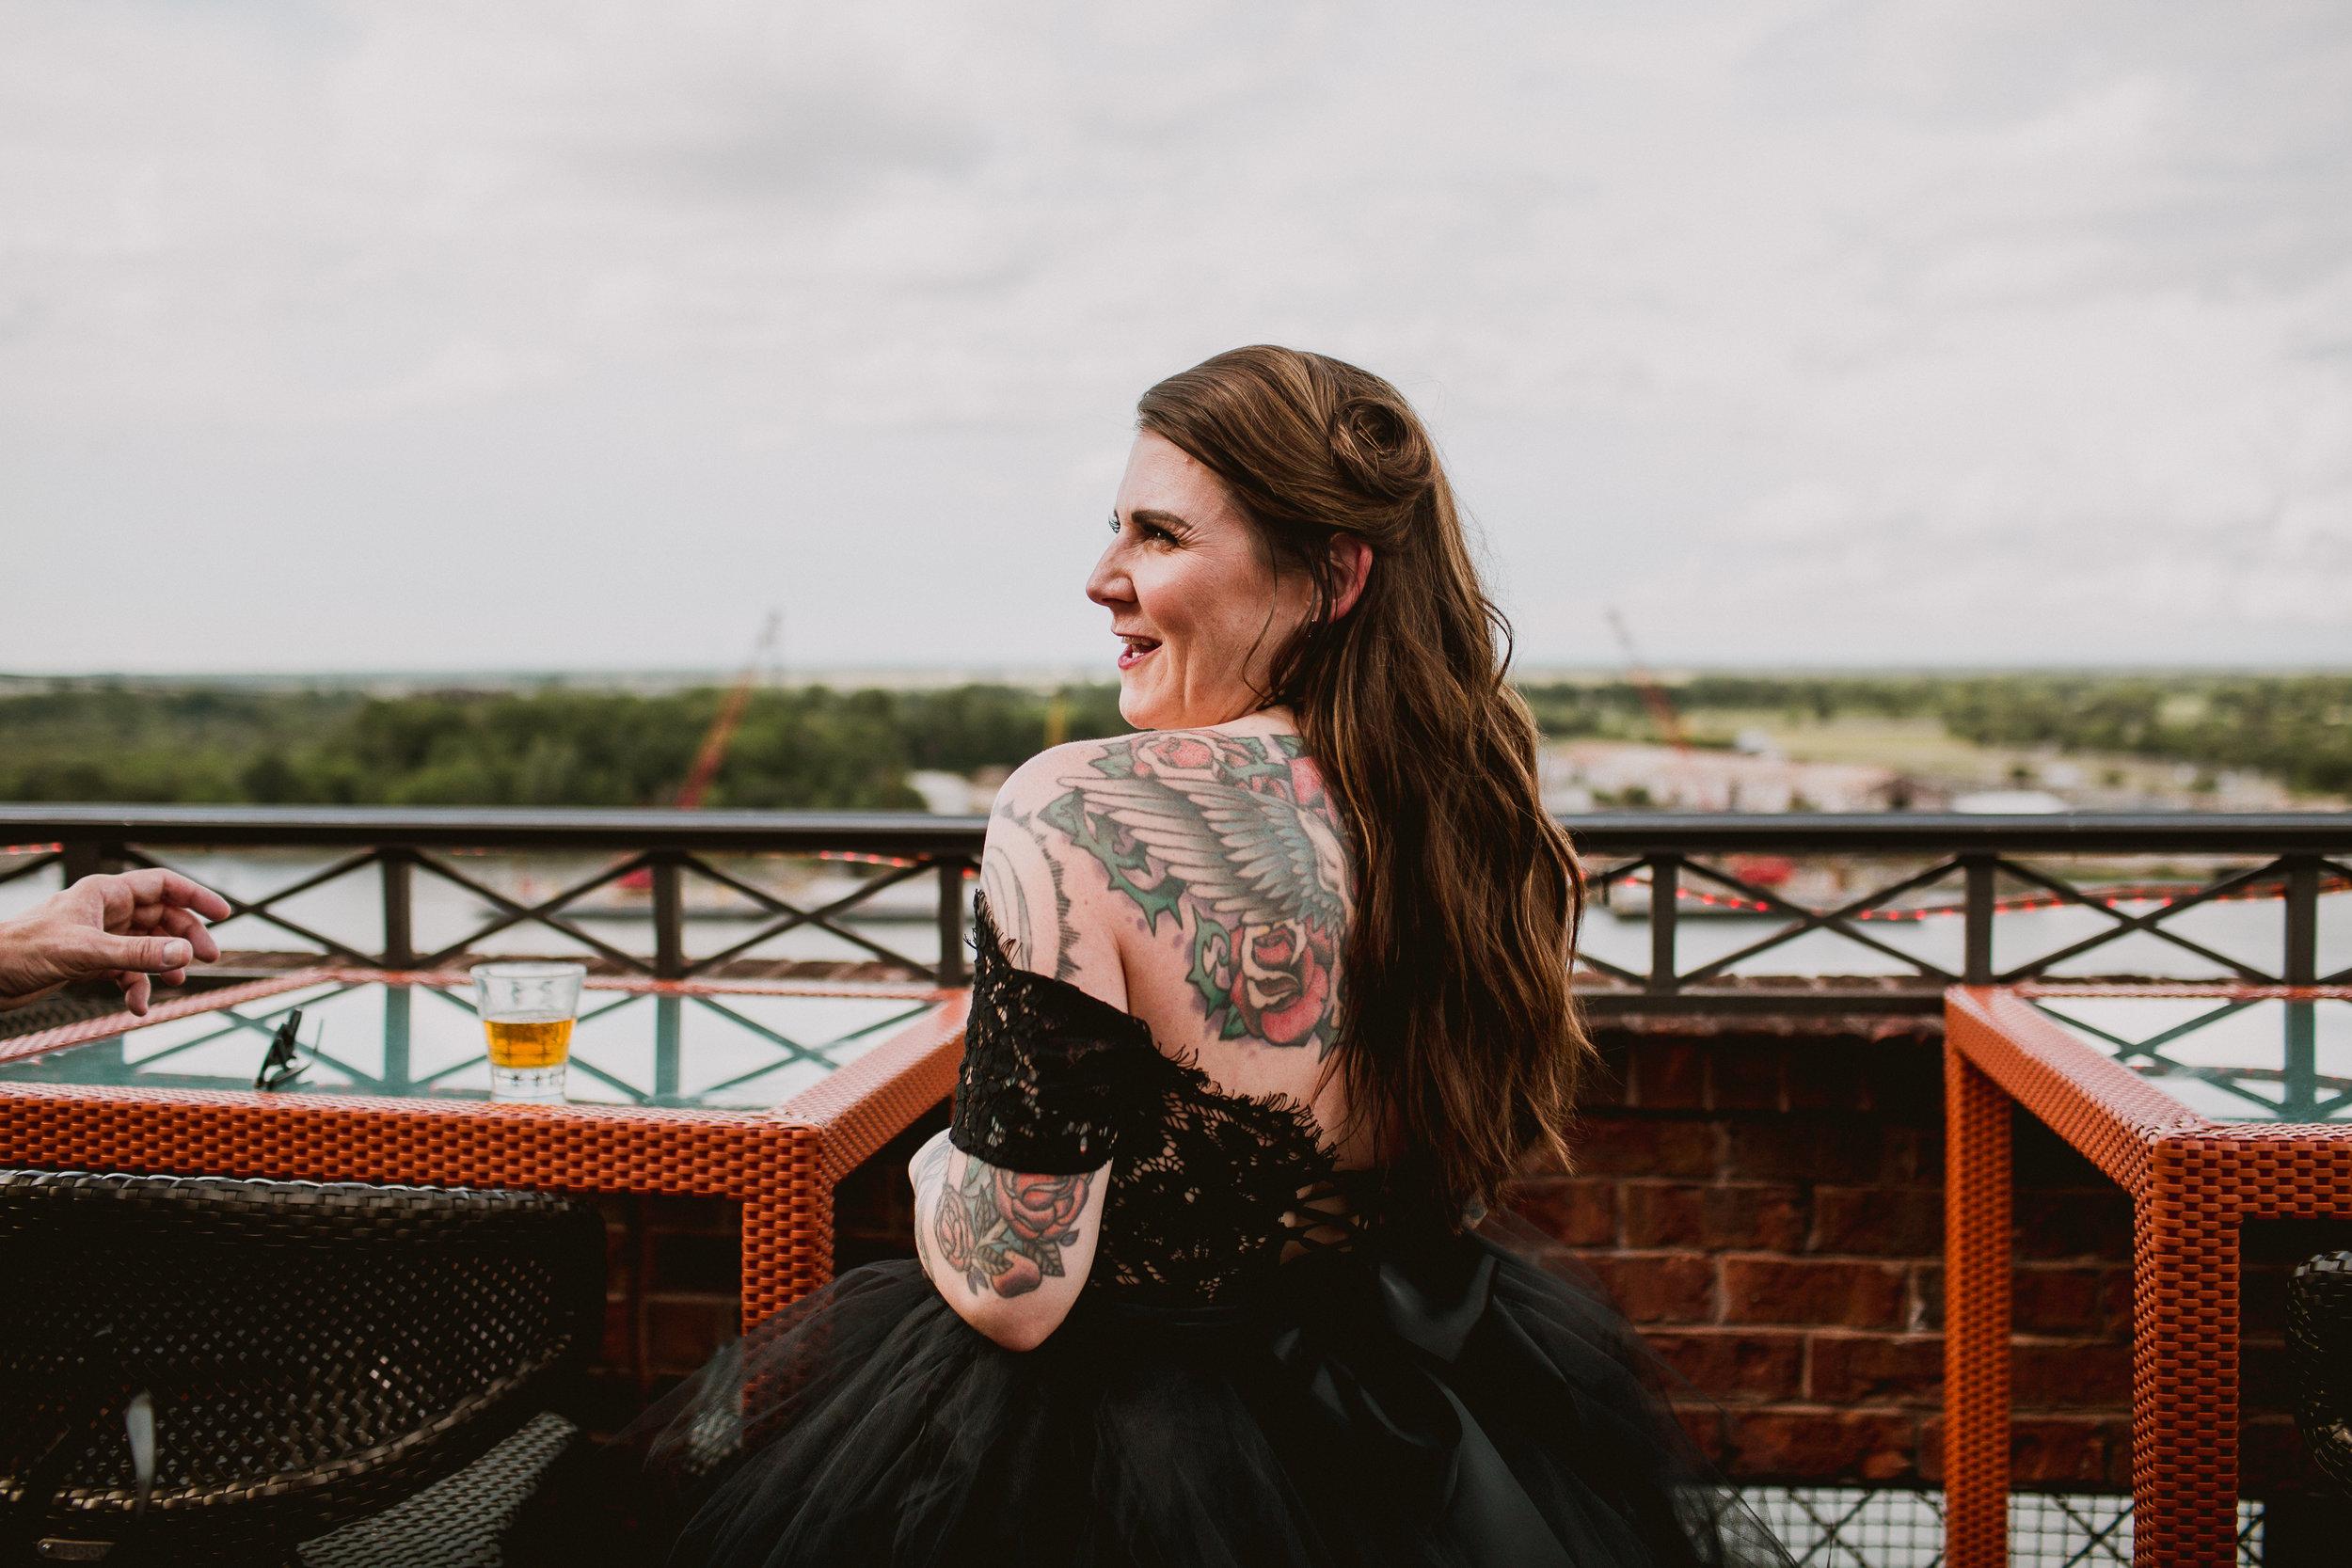 bohemian-hotel-savannah-elopement-kelley-raye-atlanta-wedding-photographer-51.jpg